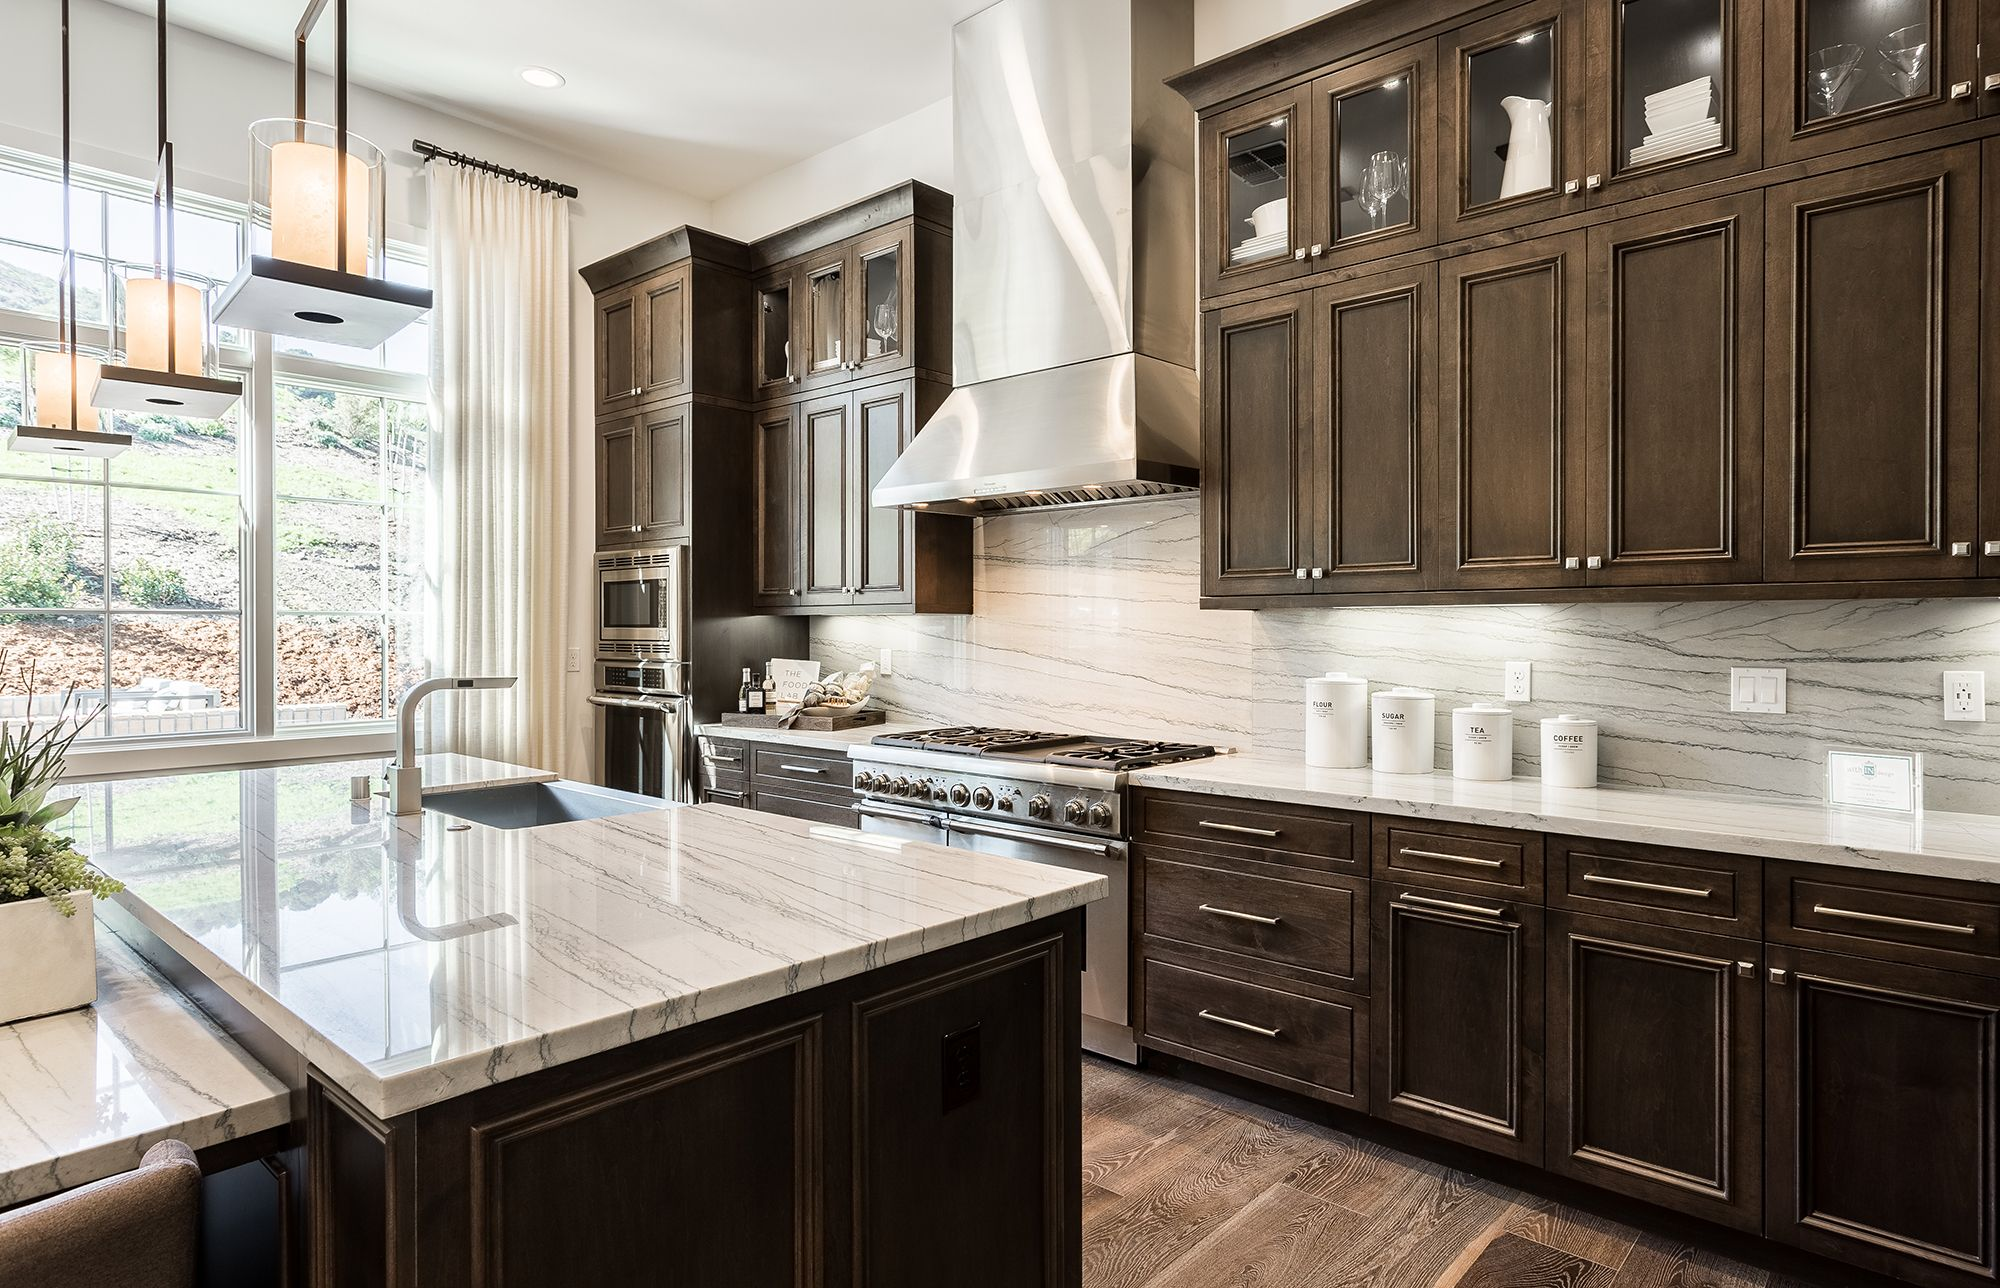 Solid Slab Backsplash With Dark Cabinets Backsplash With Dark Cabinets Dark Wood Kitchen Cabinets Kitchen Remodel Small